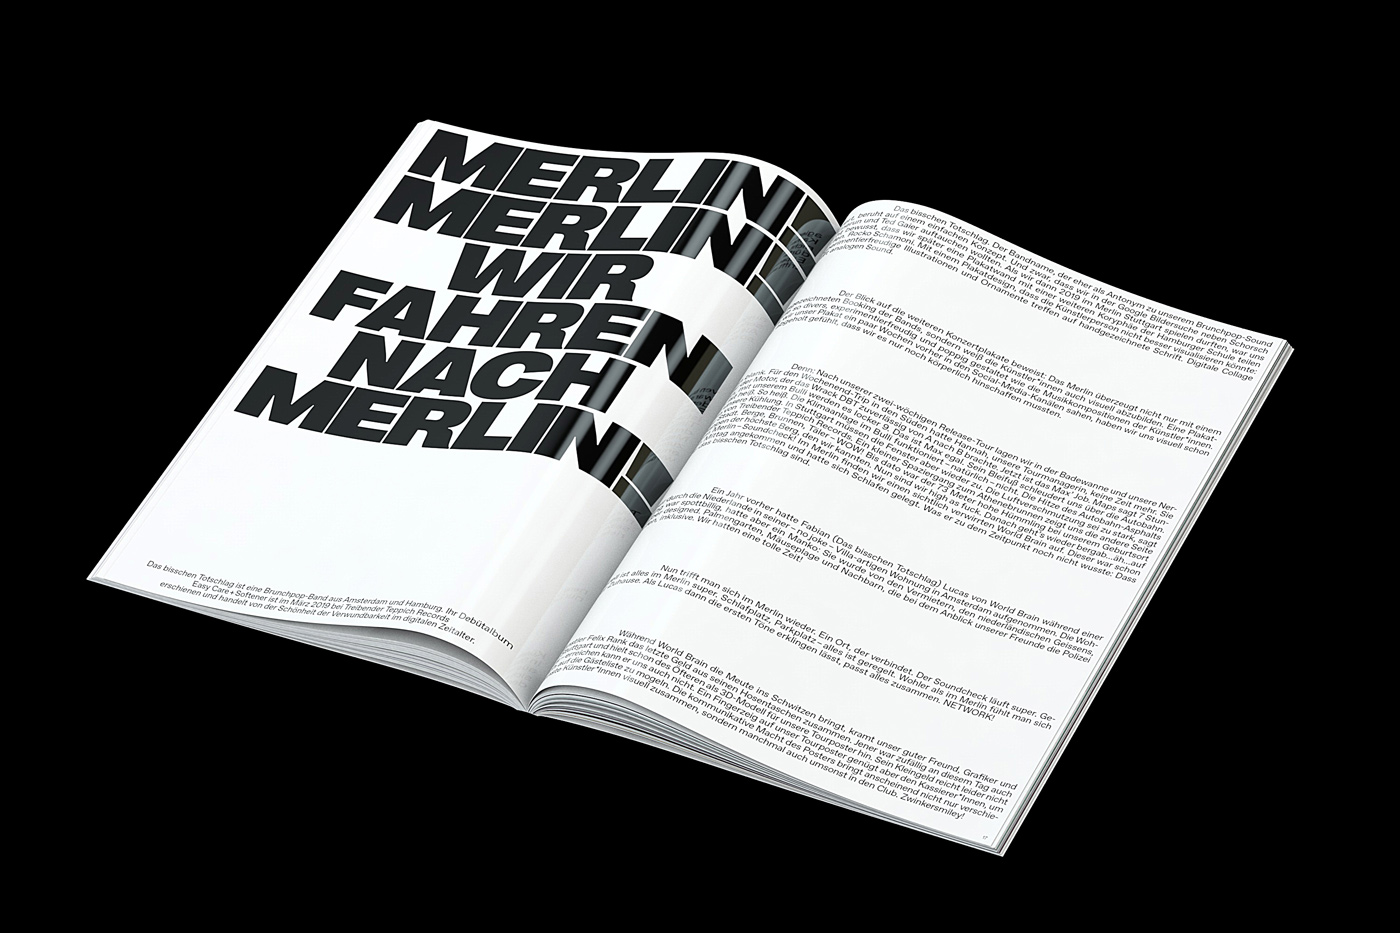 01 collide24 Mark Bohle Raffael Kormann - Mark Bohle and Raffael Kormann turn their 80-piece collection of posters for Kulturzentrum Merlin into a playful publication